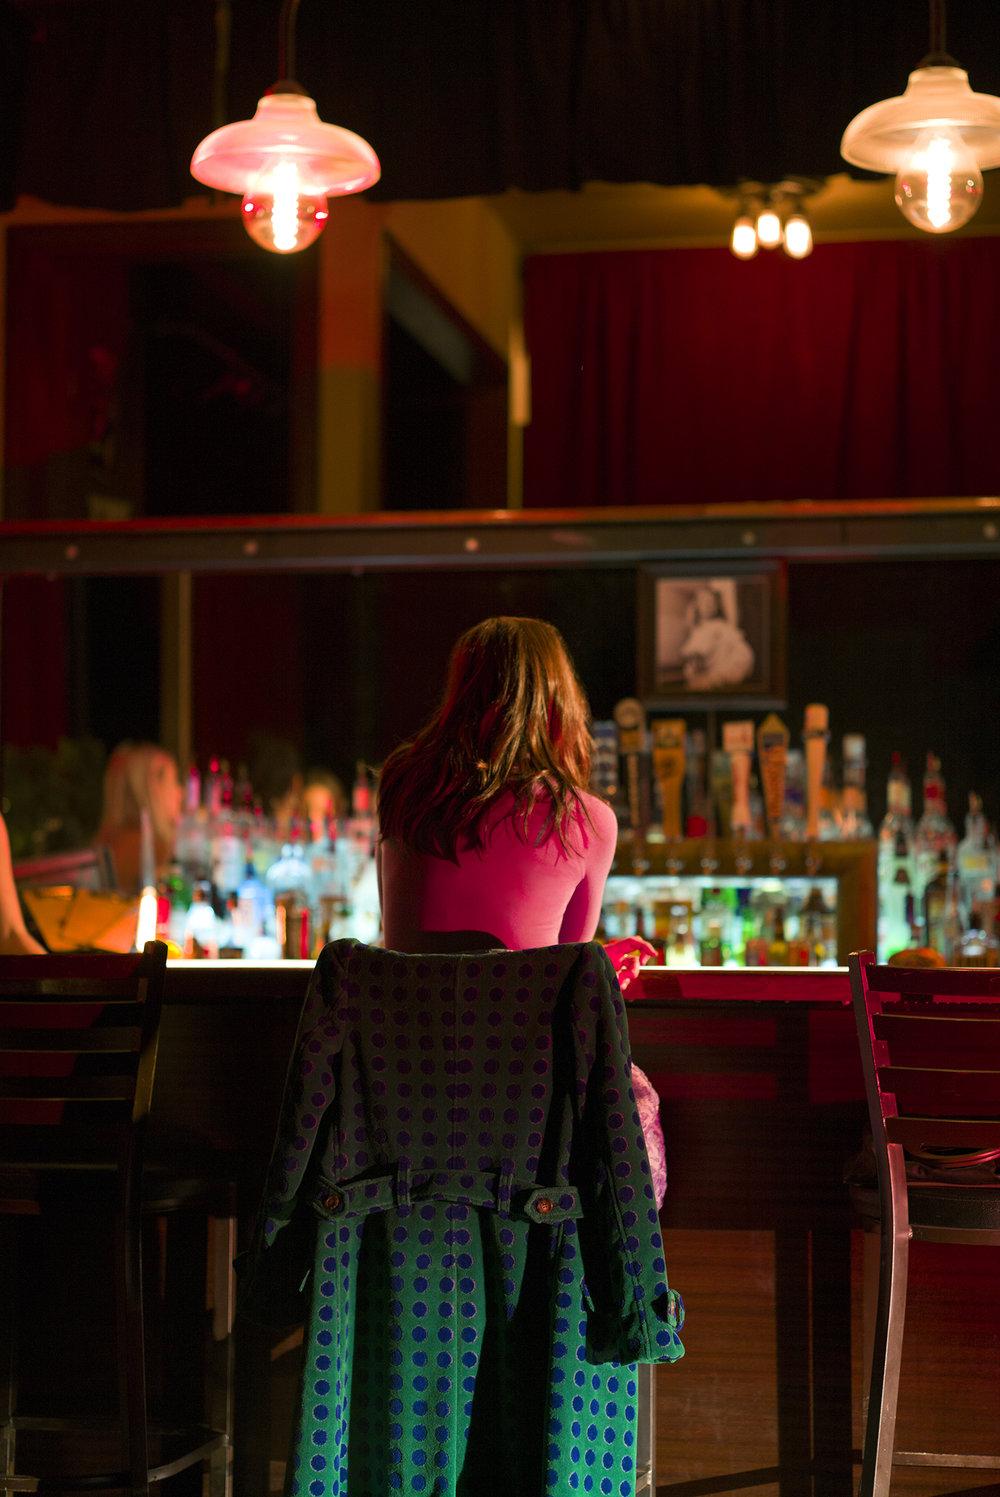 """Carmen"" directed by Chloë Sevigny, Miu Miu Women's Tales #13"